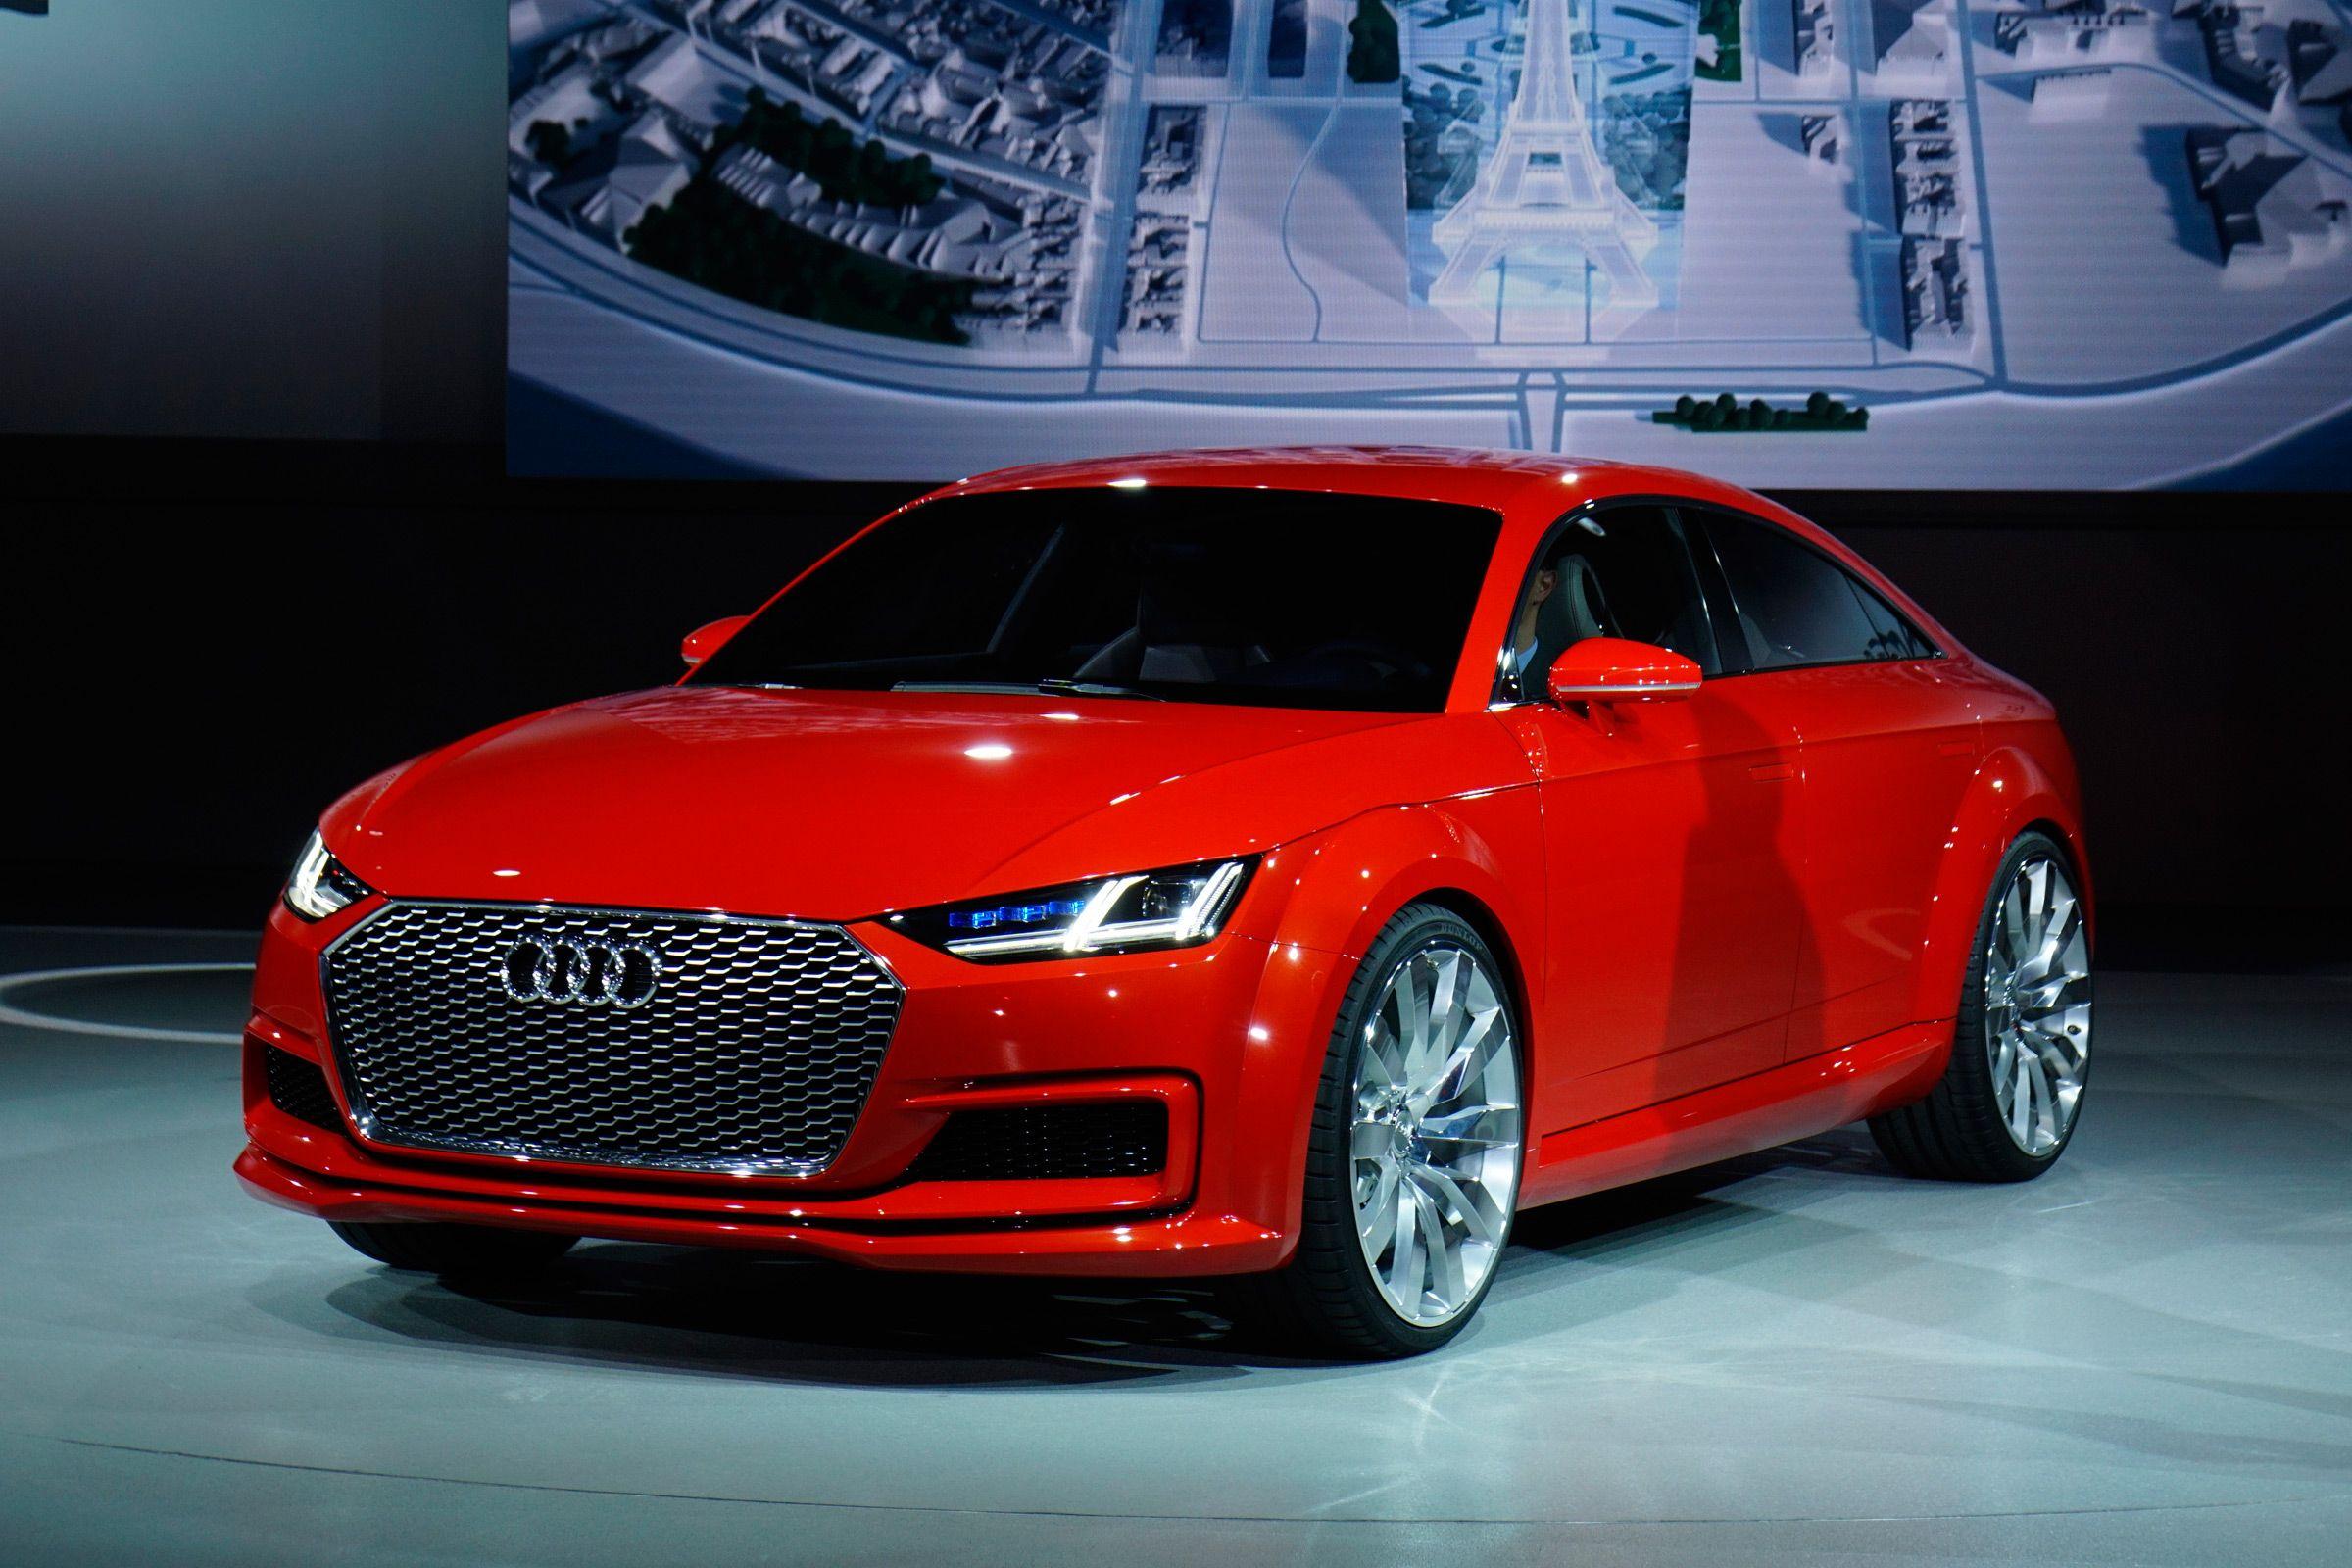 New Cars 2015 Next Year S Most Important Cars Audi Tt Audi Sportback Audi